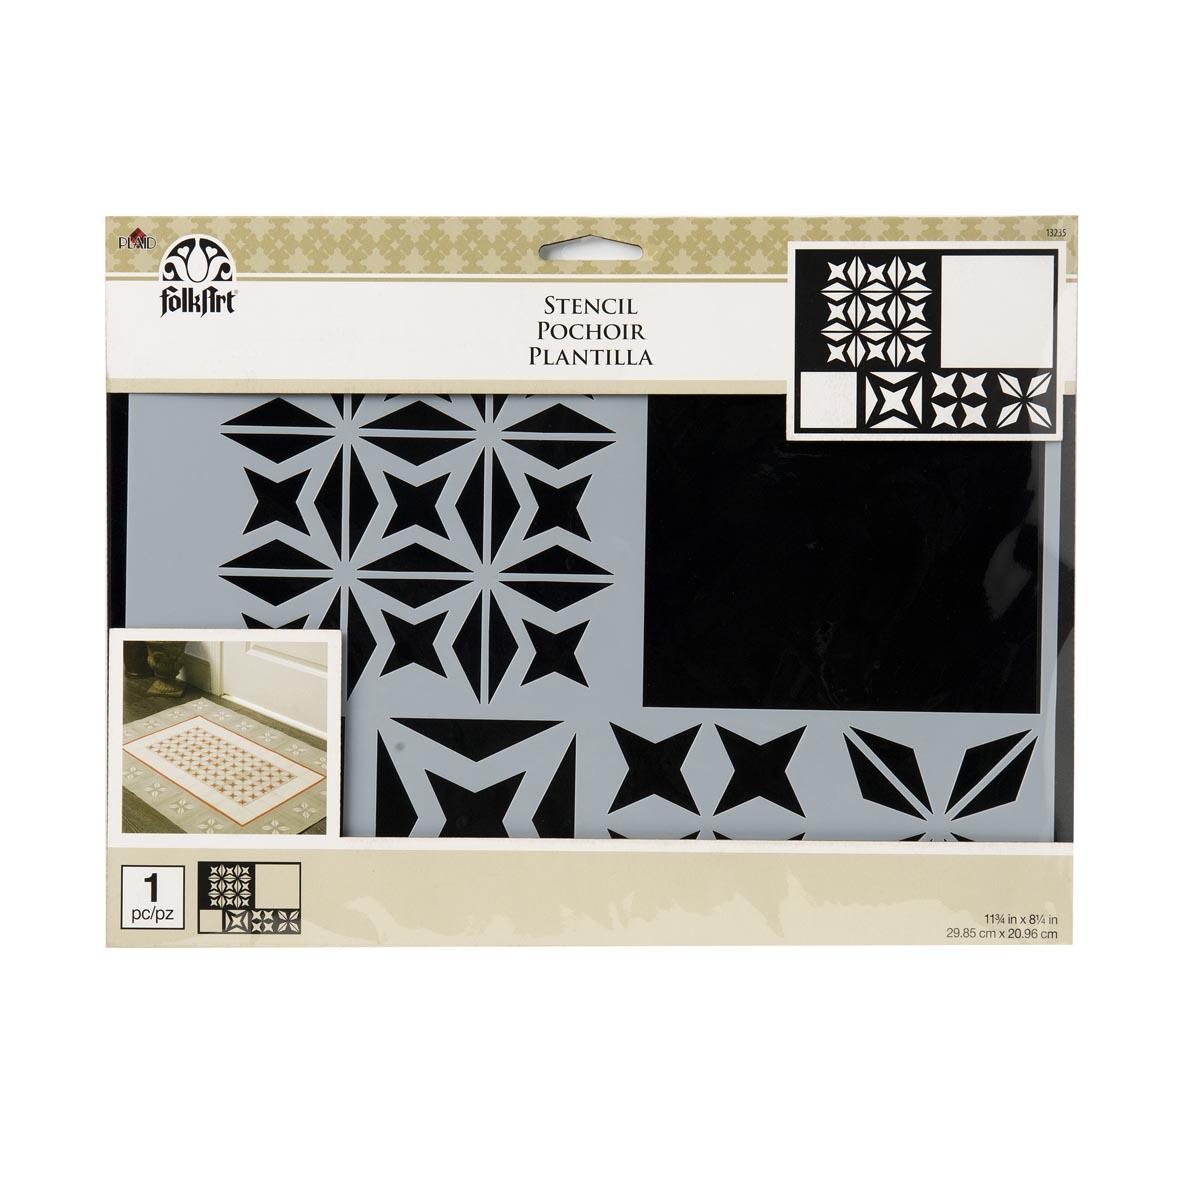 FolkArt ® Painting Stencils - Starburst Tile - 13235